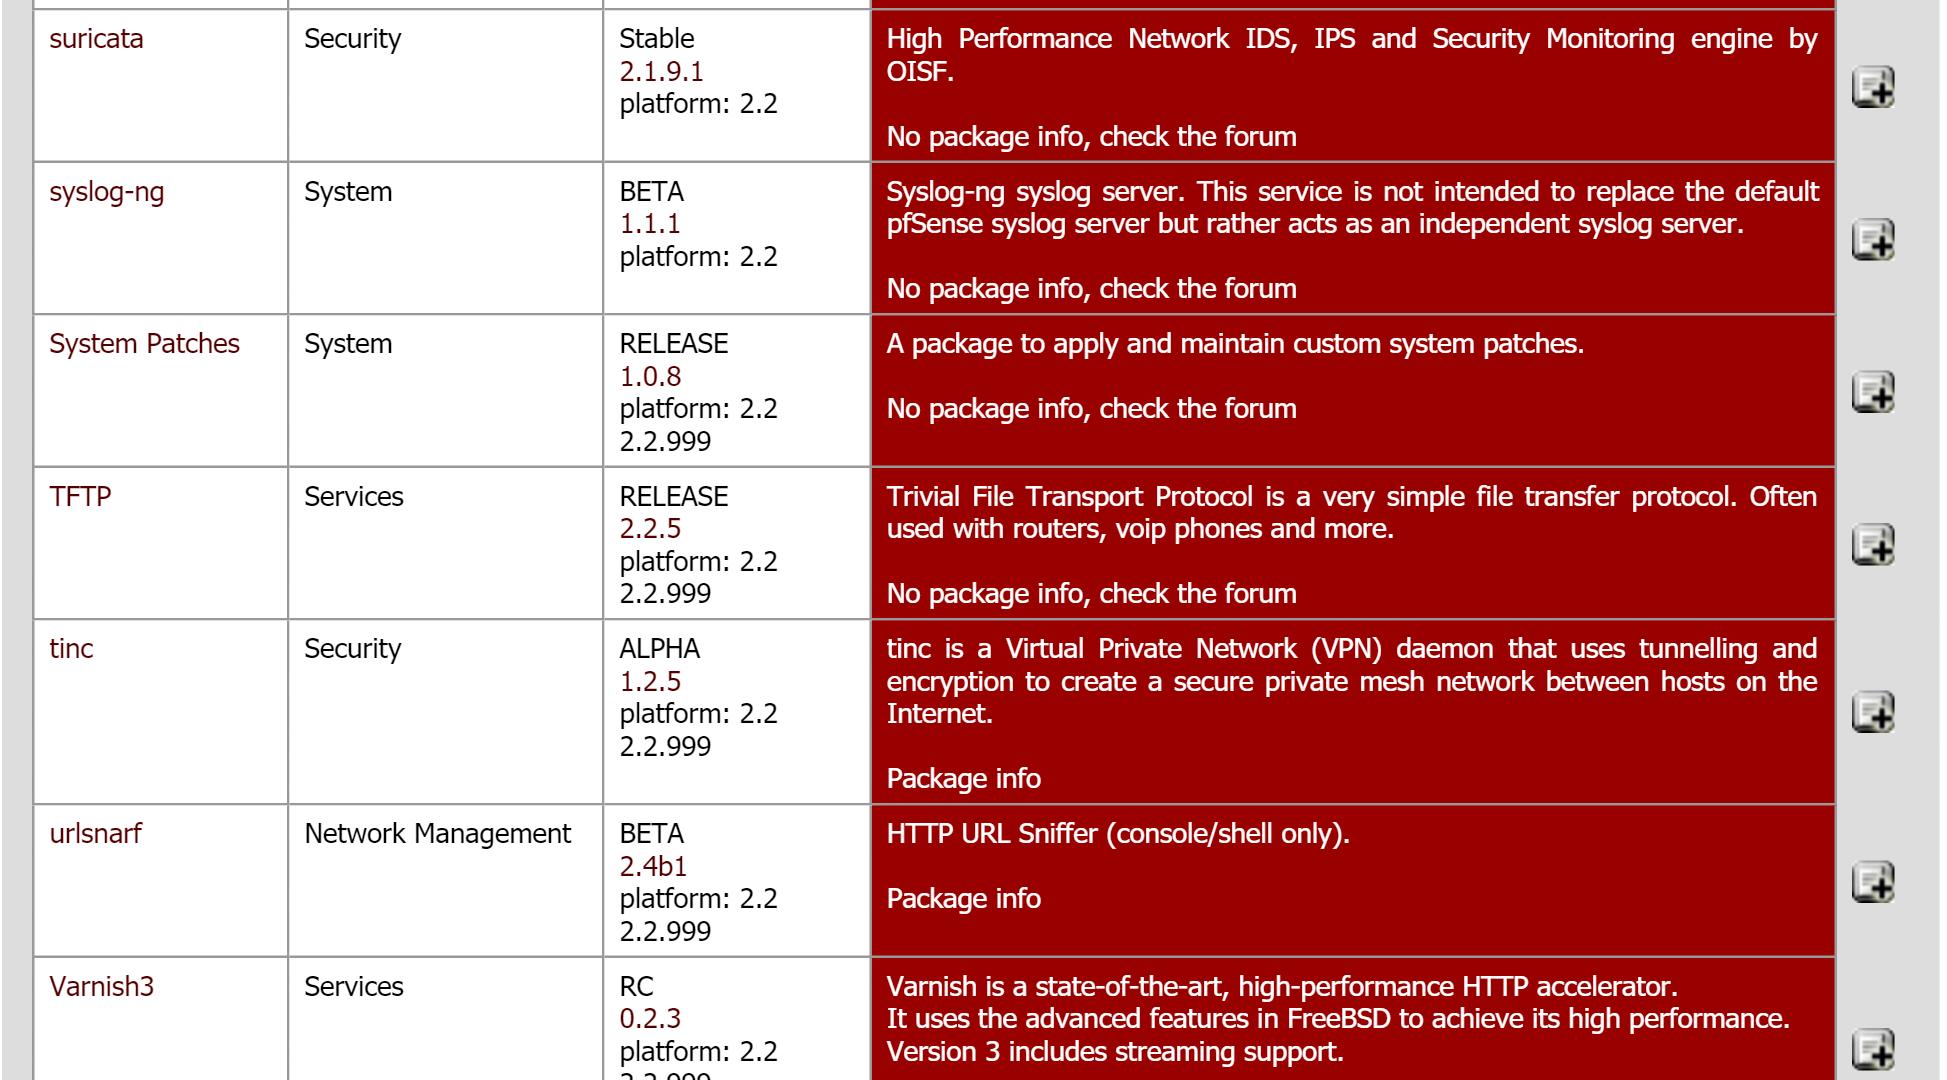 pfSense suricata package listed - ServeTheHome